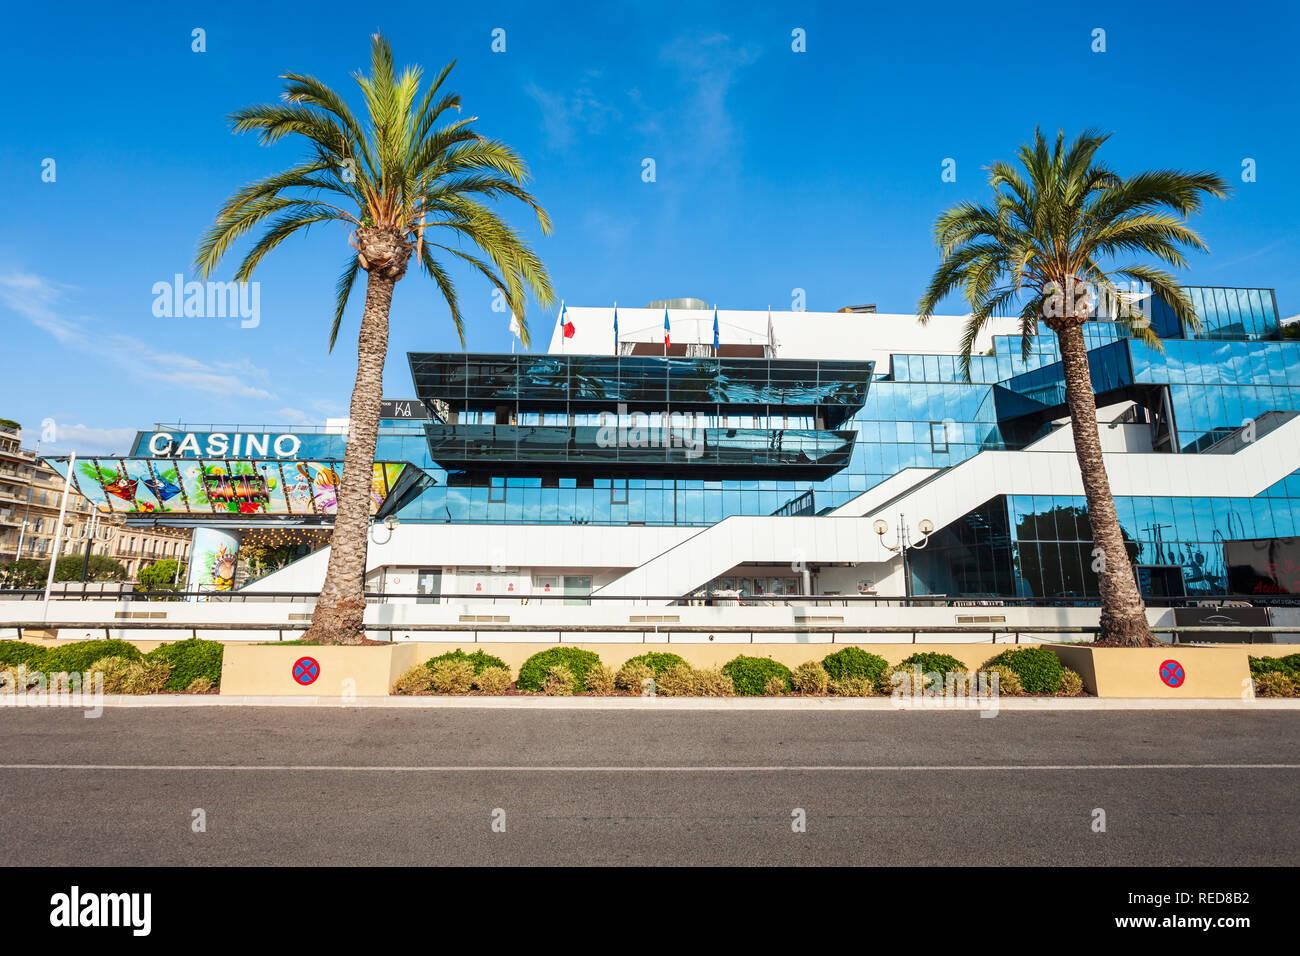 Cannes casino casino gaming license nj